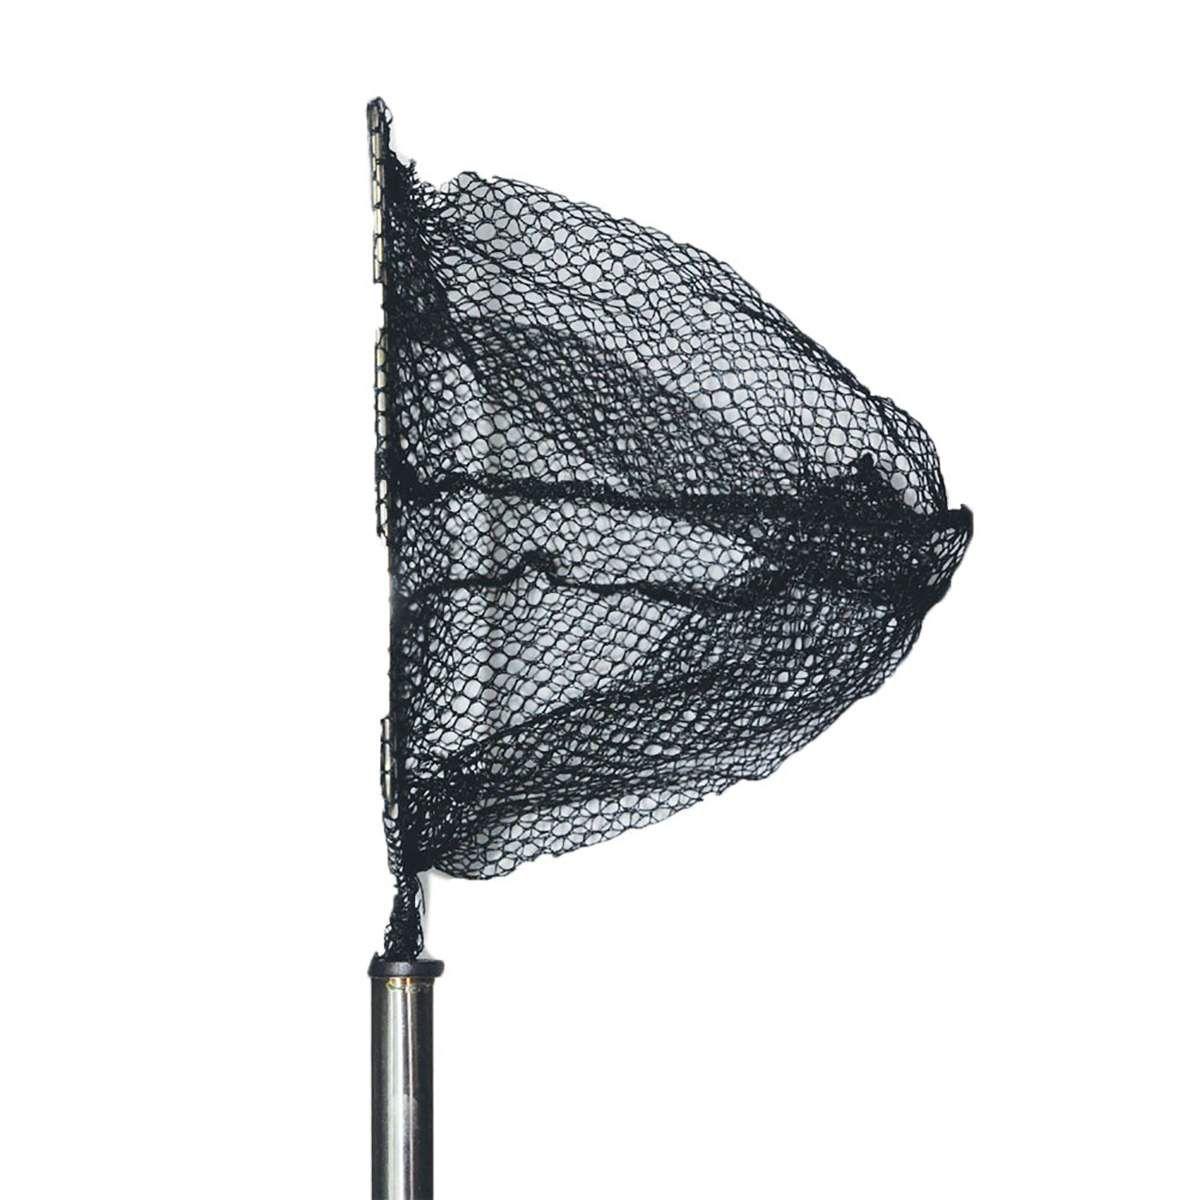 Boyu Rede Cabo Inox FC-8 - 20,3cm